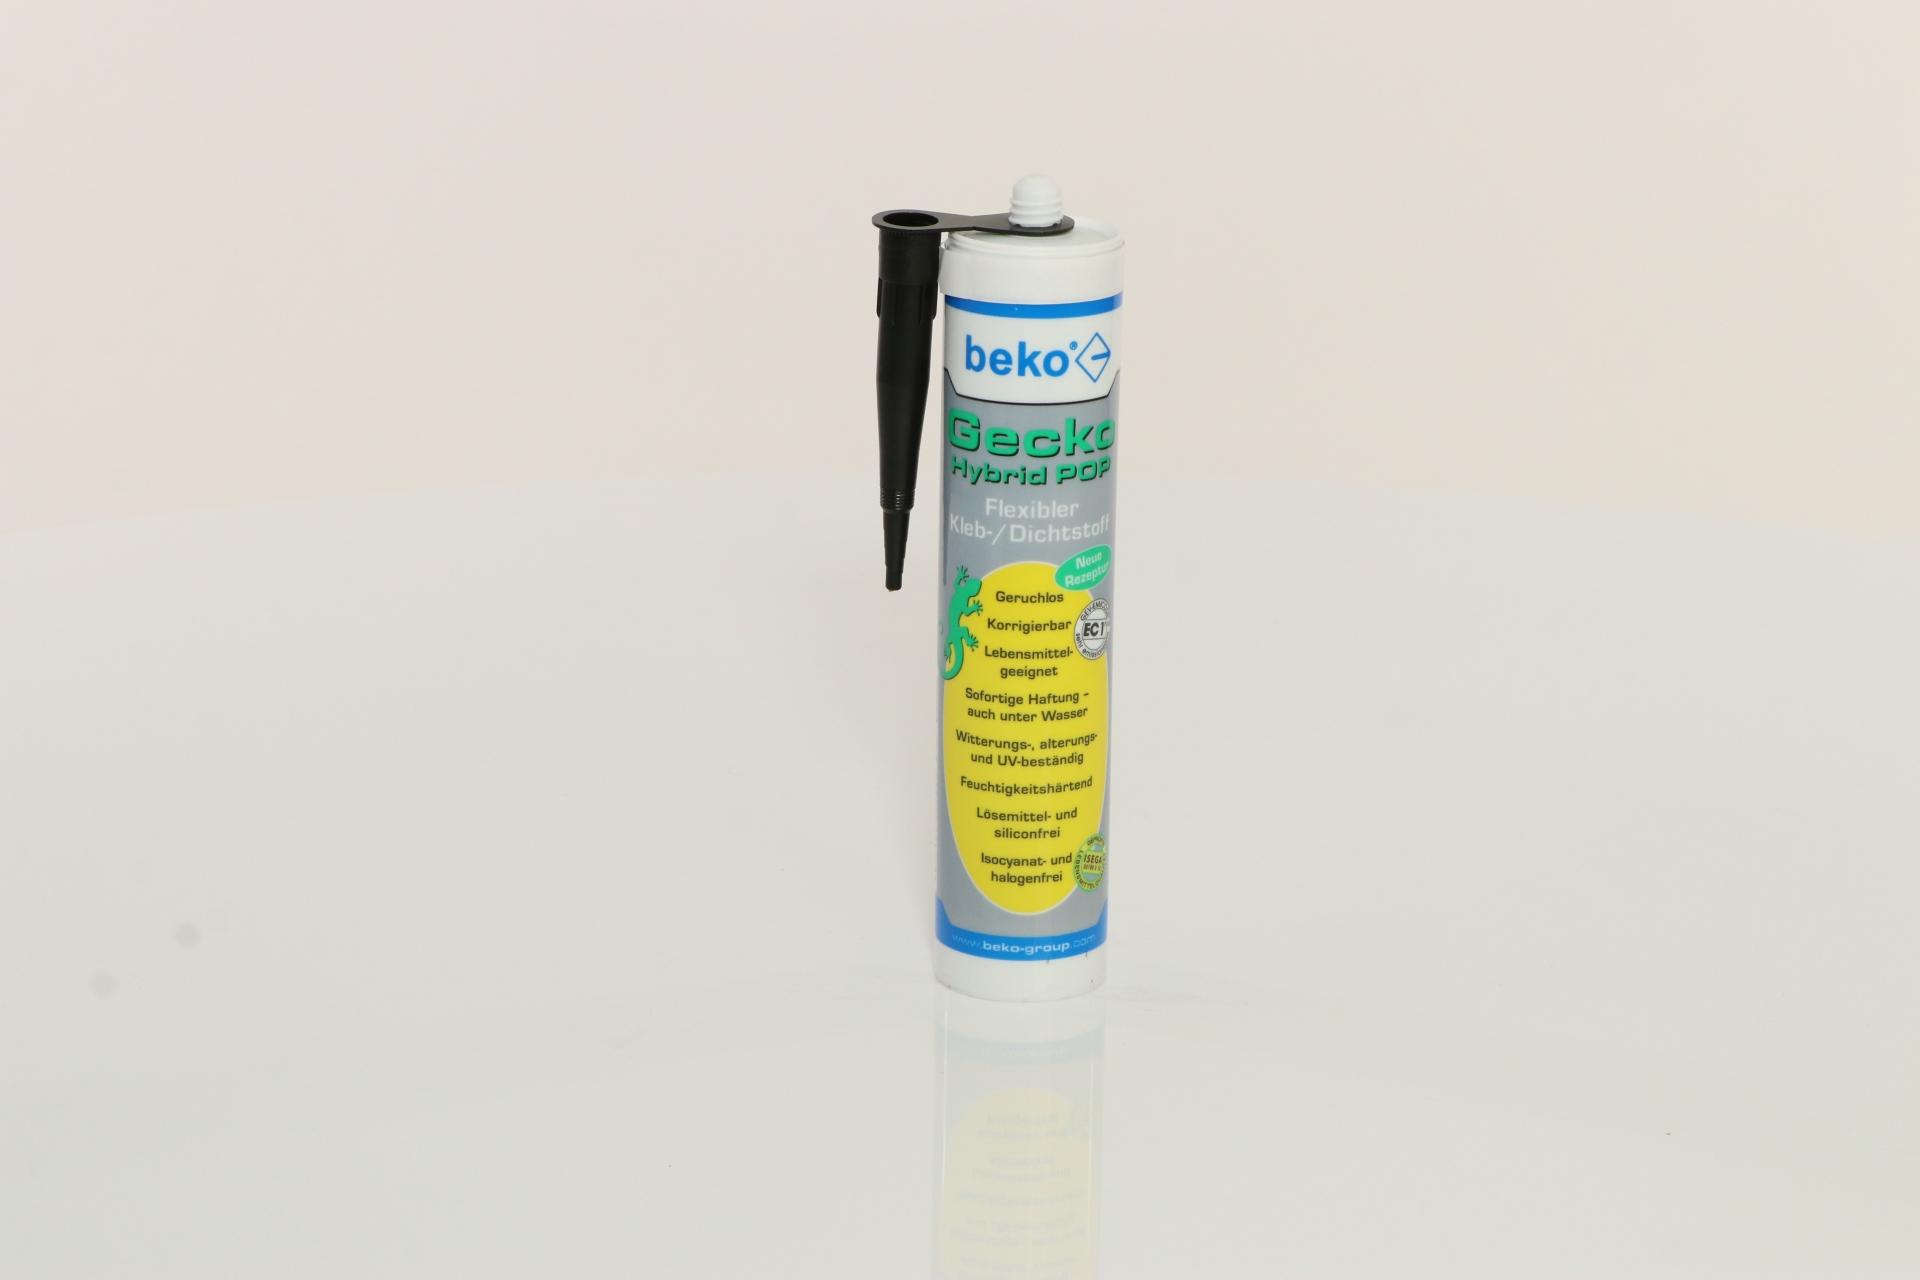 beko Gecko Hybrid Pop, flexibler 1K Kleb-/Dichtstoff, schwarz